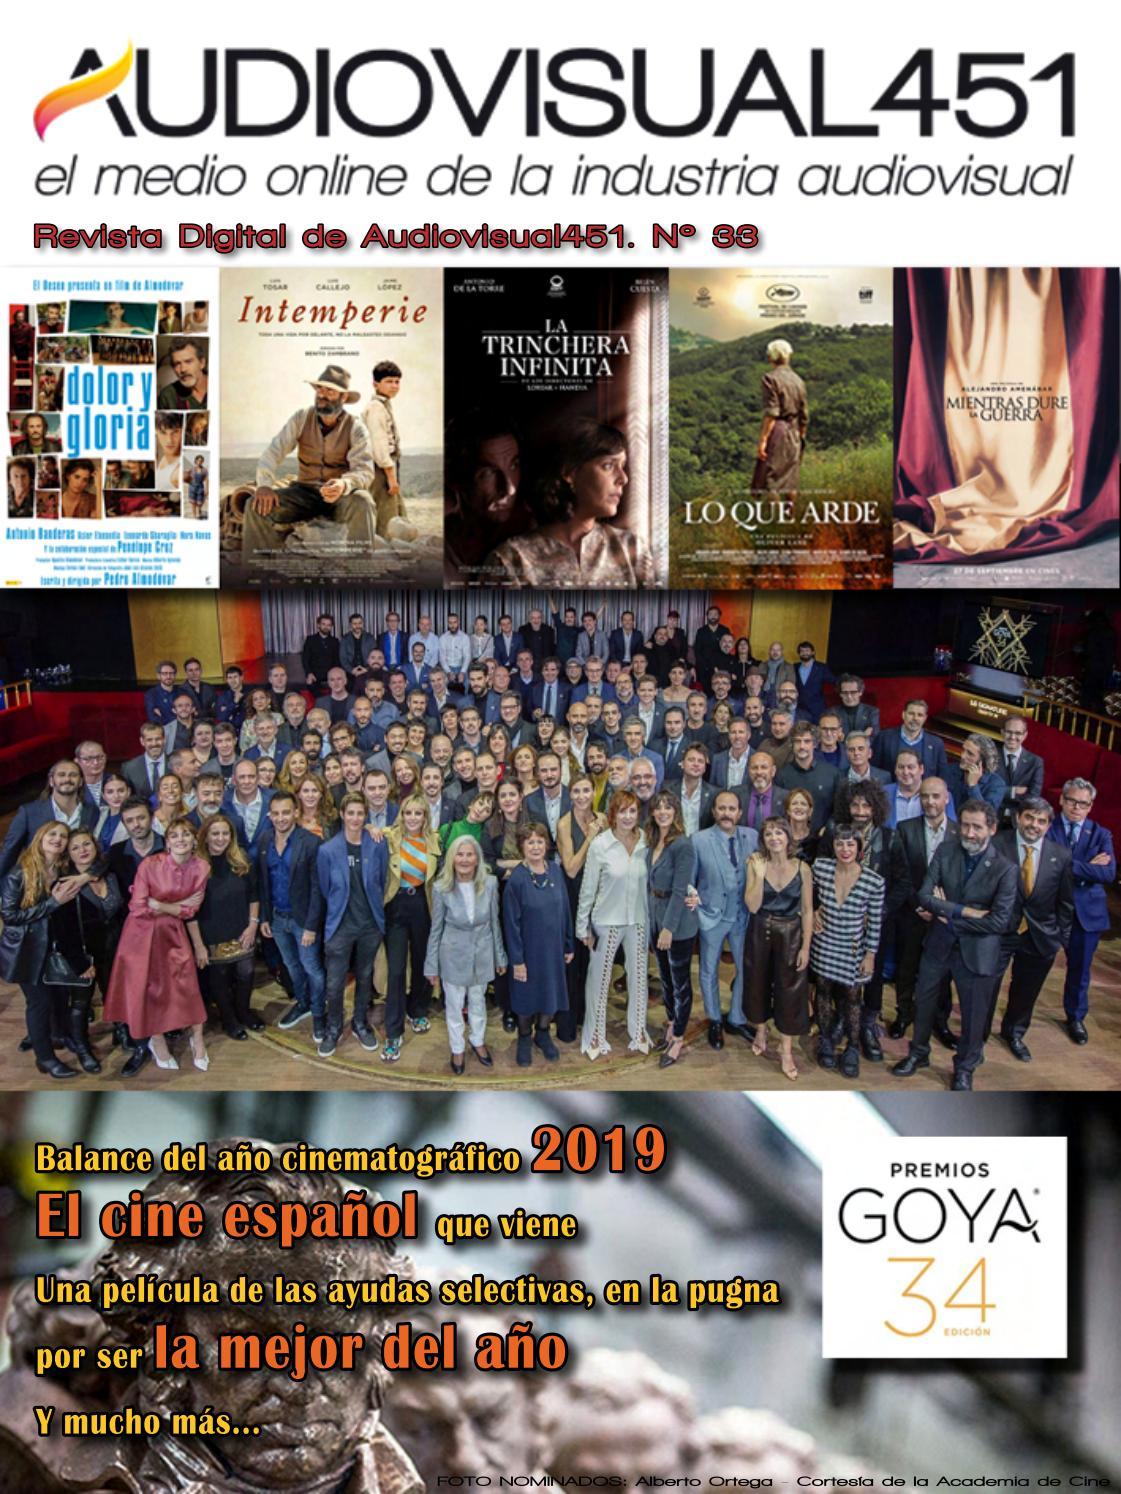 Revista Especial Premios Goya 2020 Audiovisual451 By Audiovisual451 Issuu